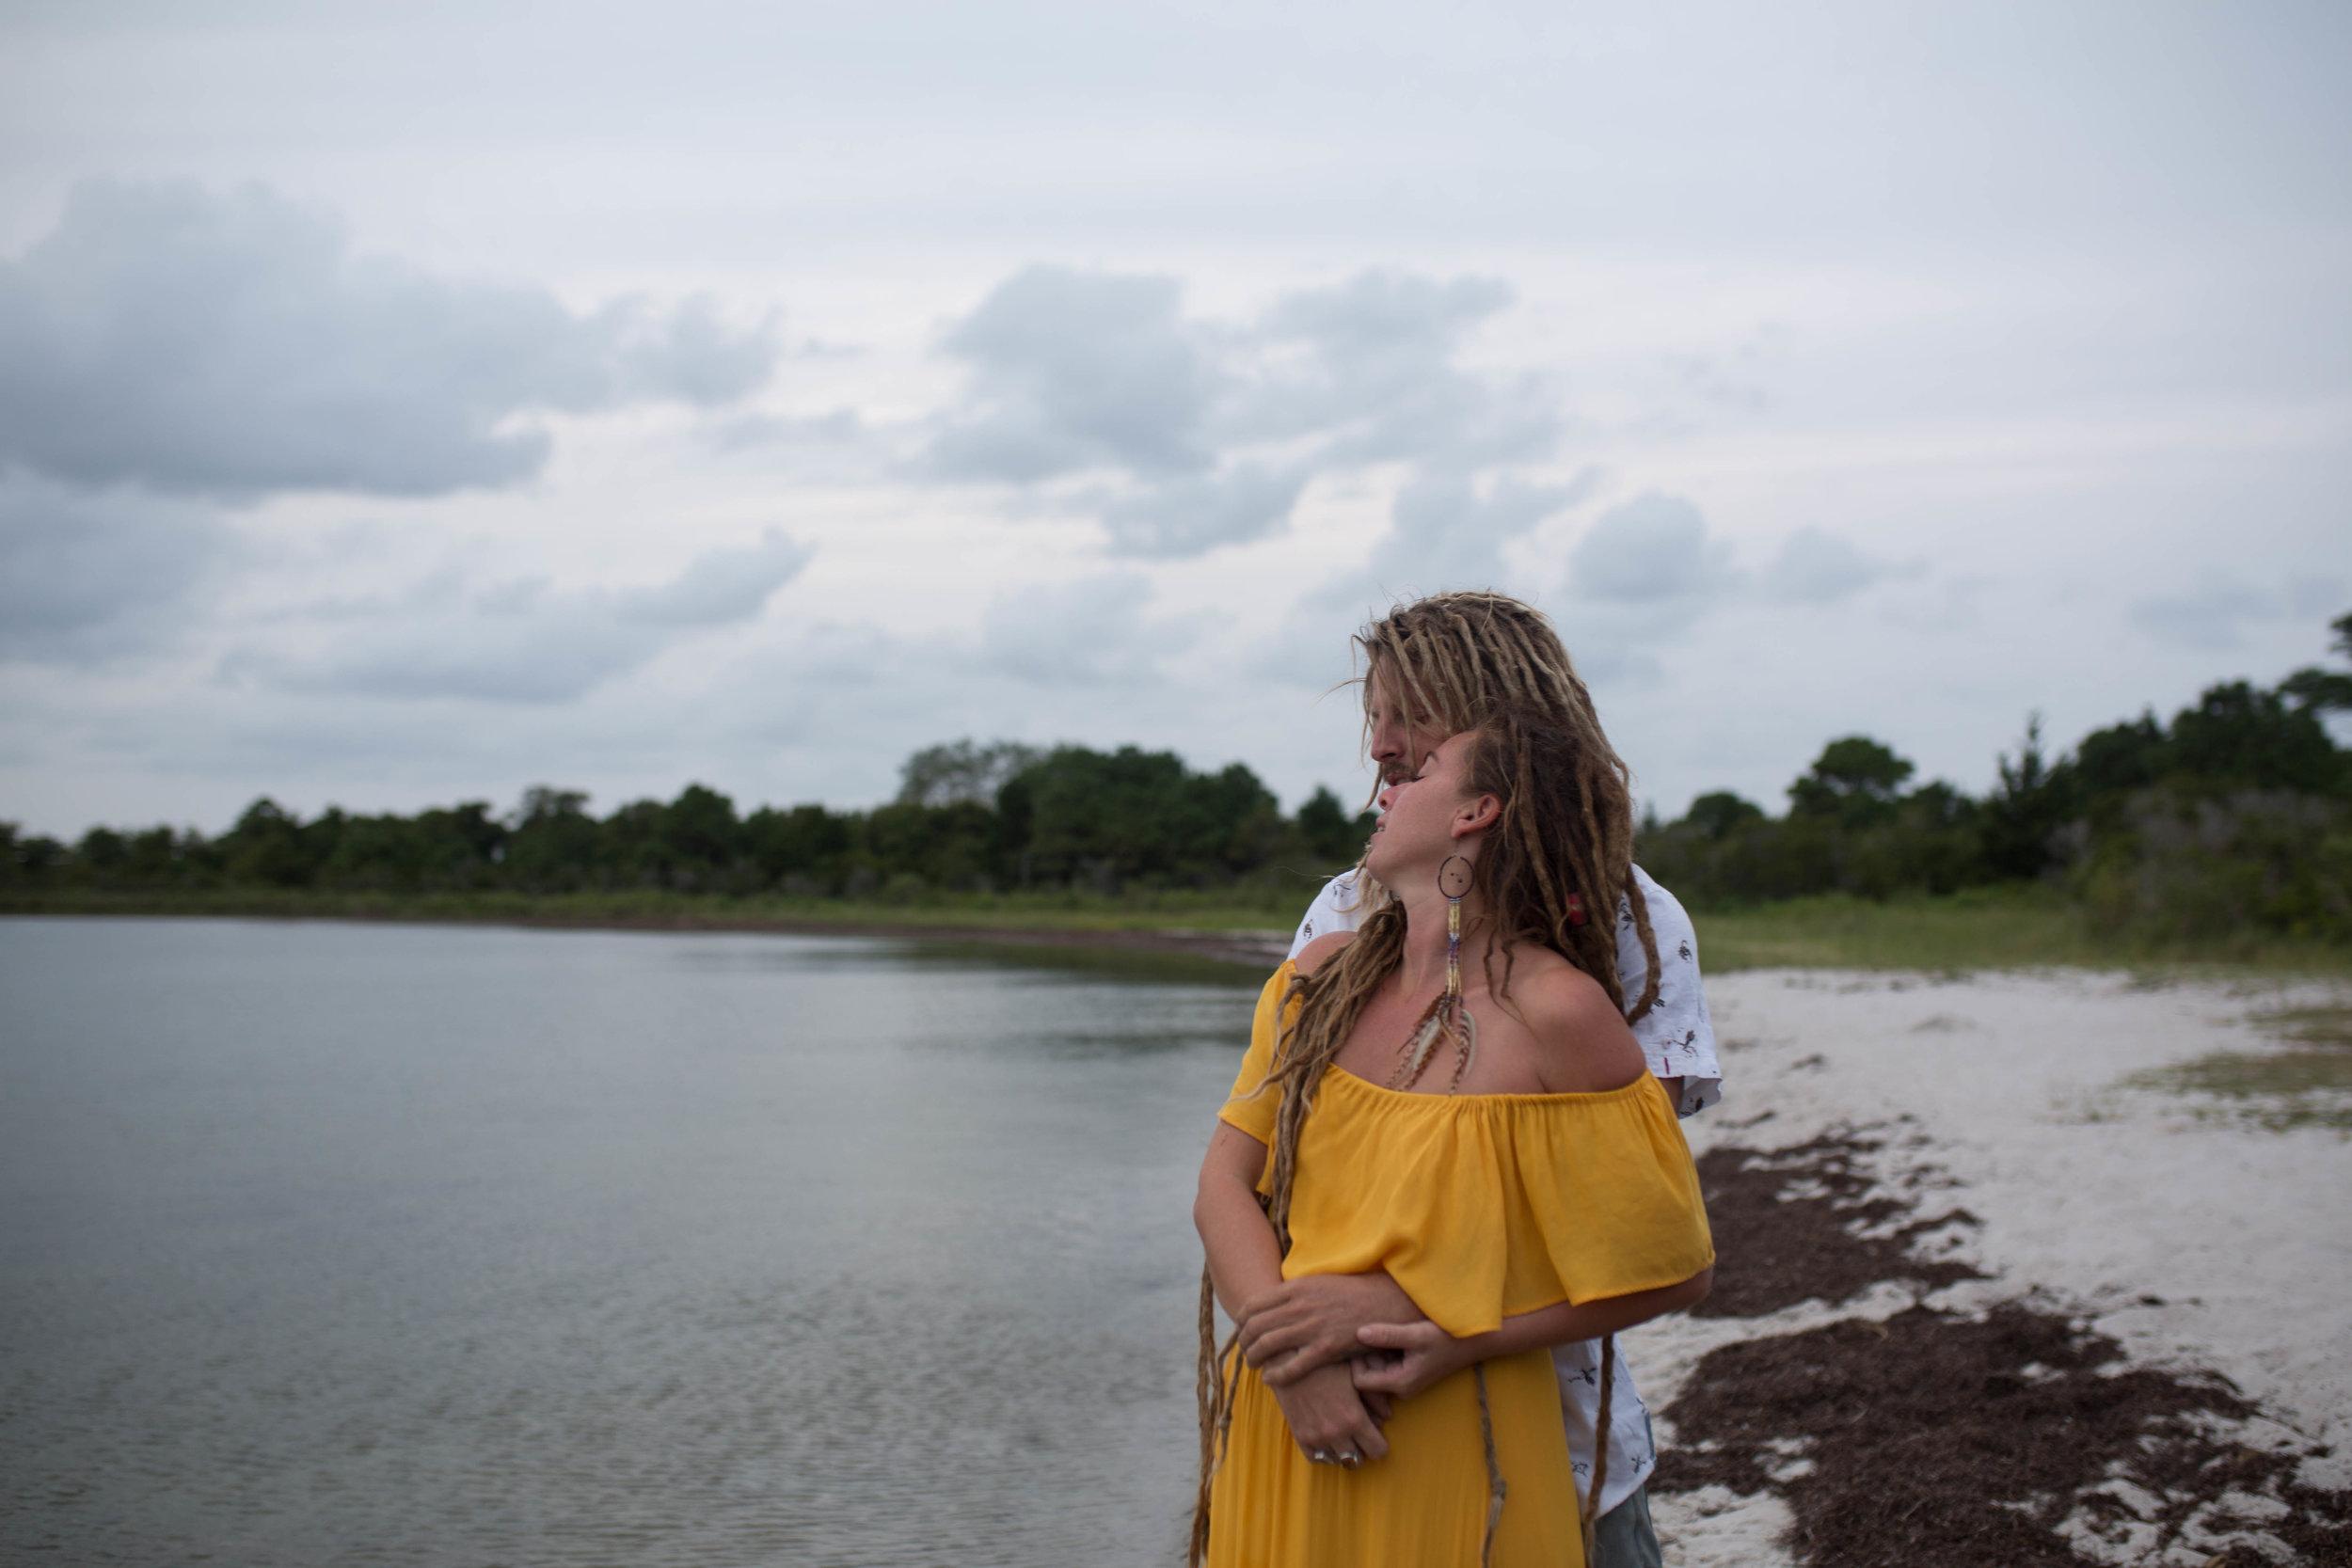 Assateague Island Photographer - Family Photographer - Pittsburgh Family Photographer - Beach Photography-0547-2.jpg